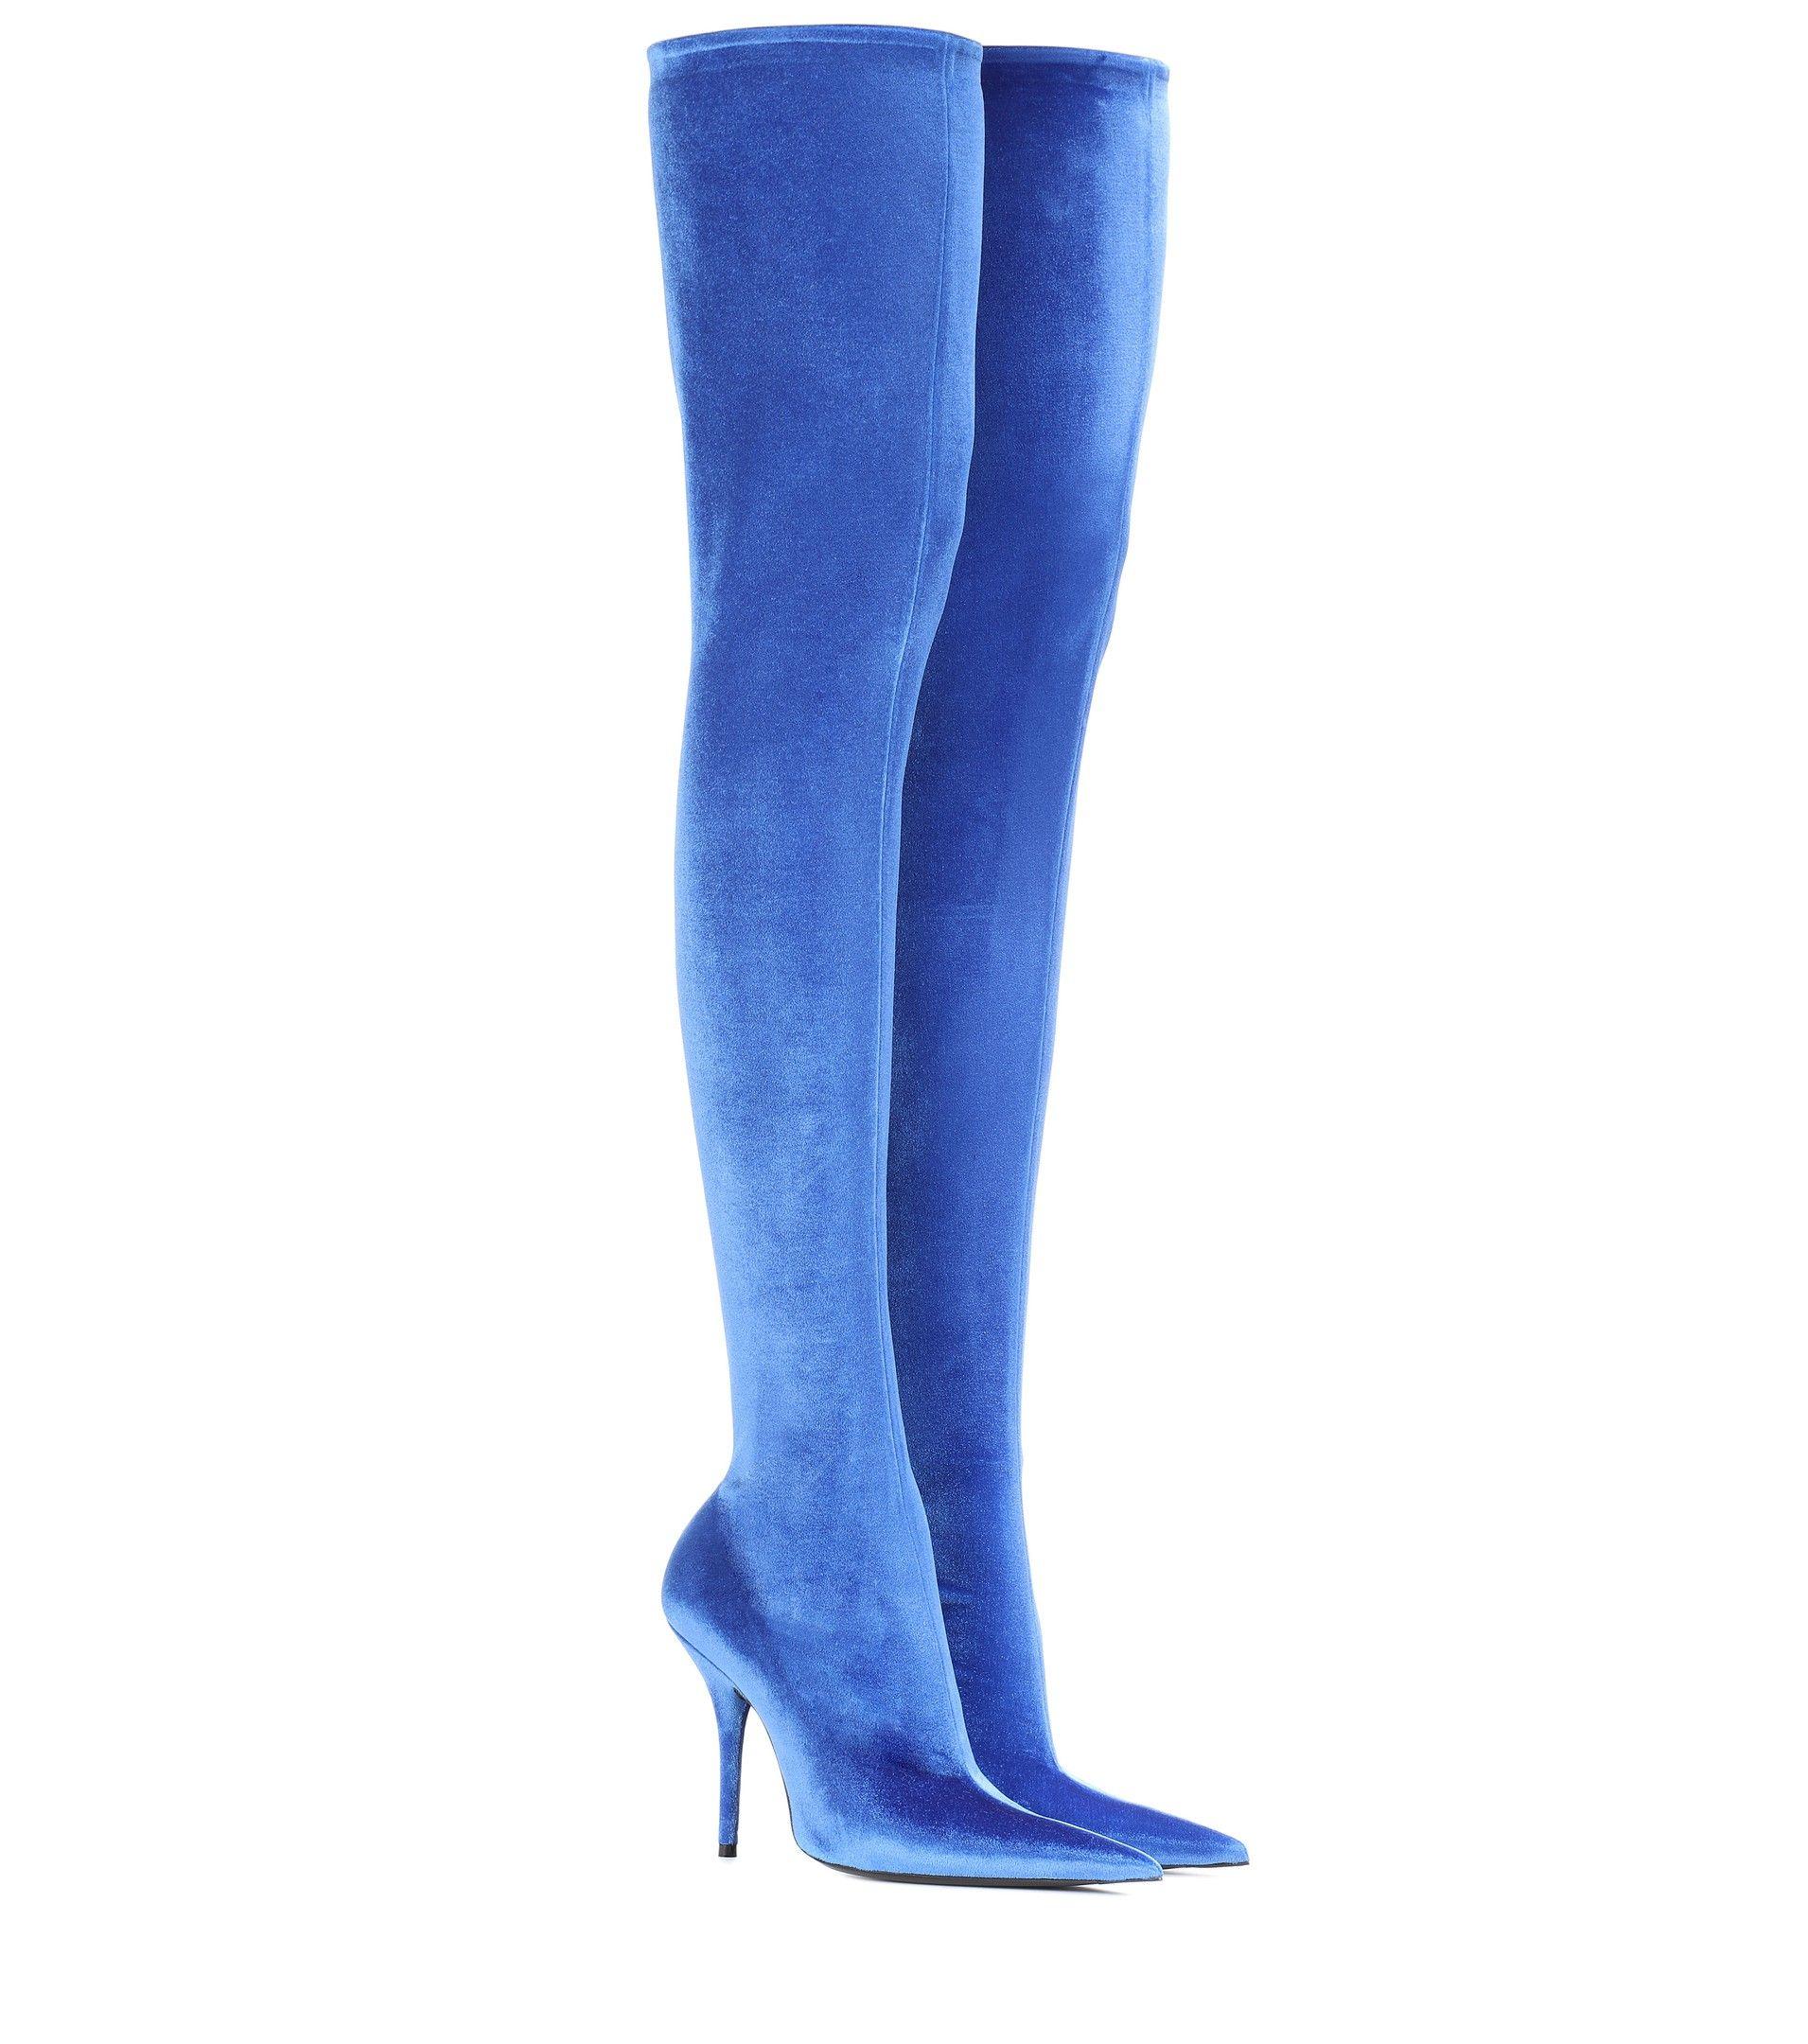 a2a4781ce836 BALENCIAGA Knife Blue Velvet Over-The-Knee Boots   1